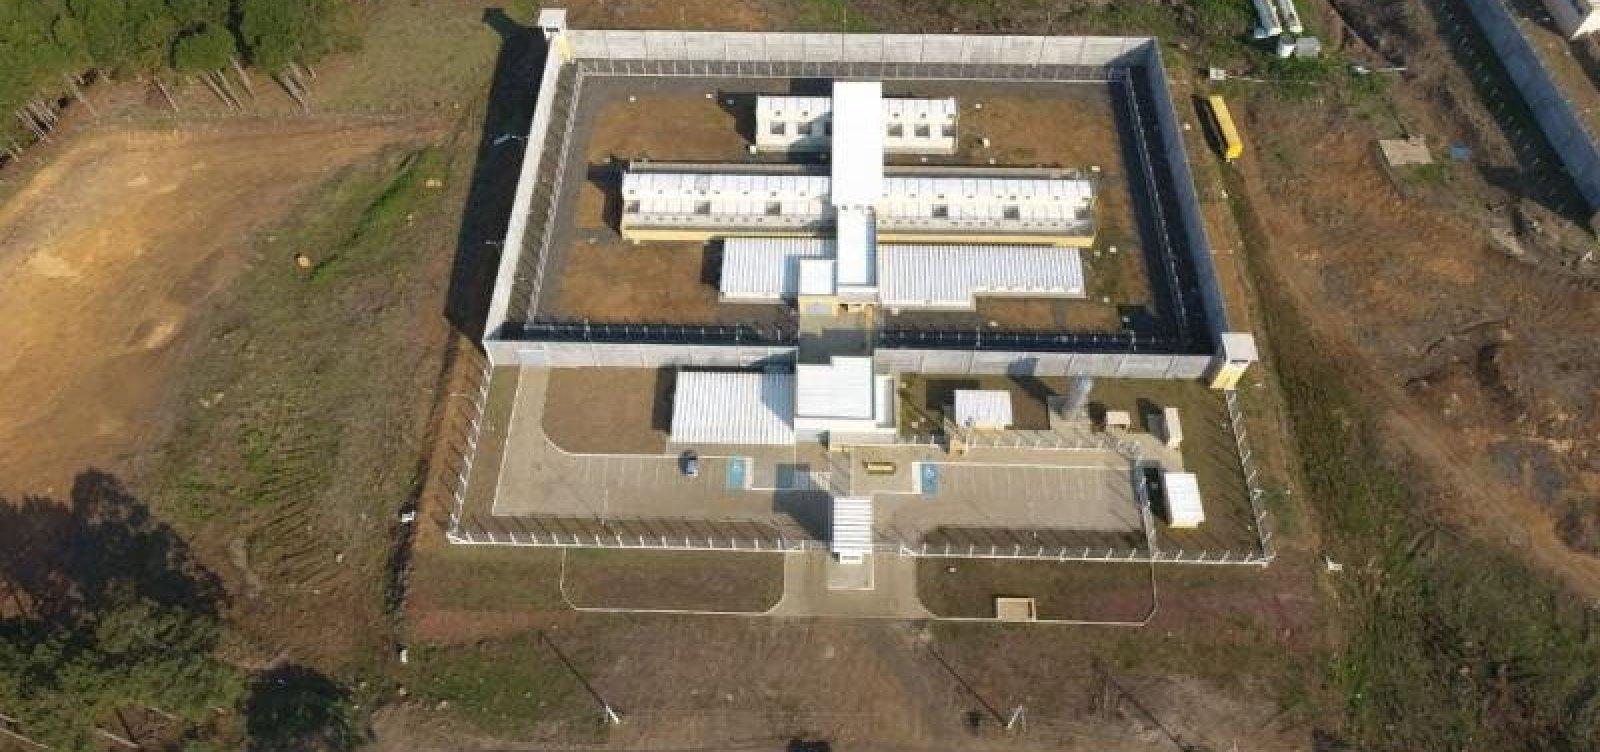 Casos de Covid ultrapassam a marca de 100 mil em presídios e unidades socioeducativas